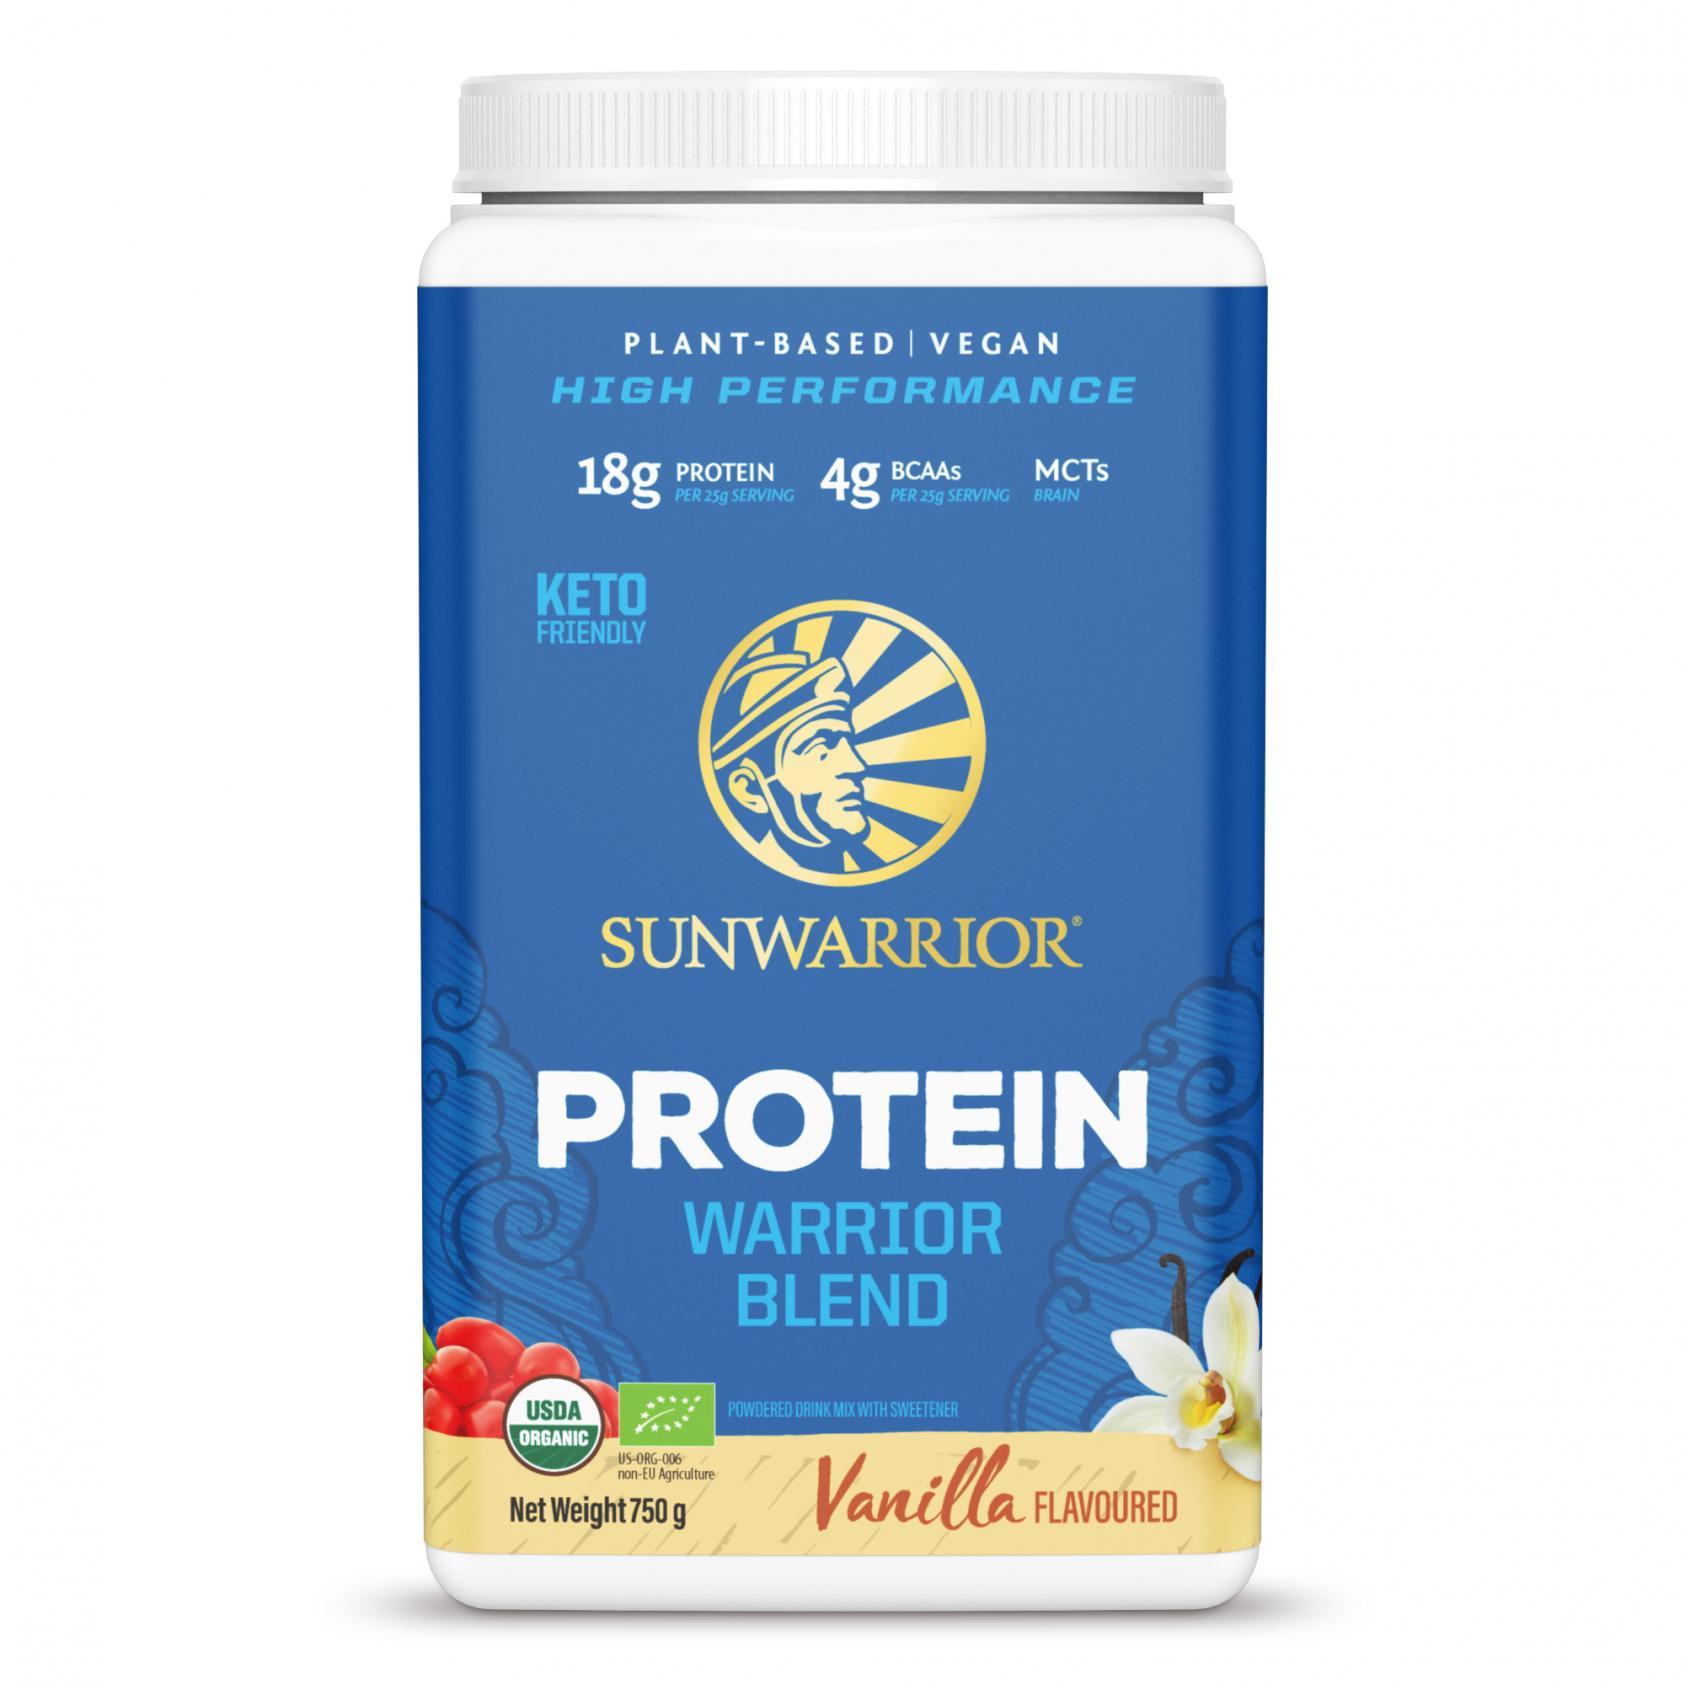 Protein Warrior Blend Vanilla 750g (Blue Tub) (Currently Unavailable)